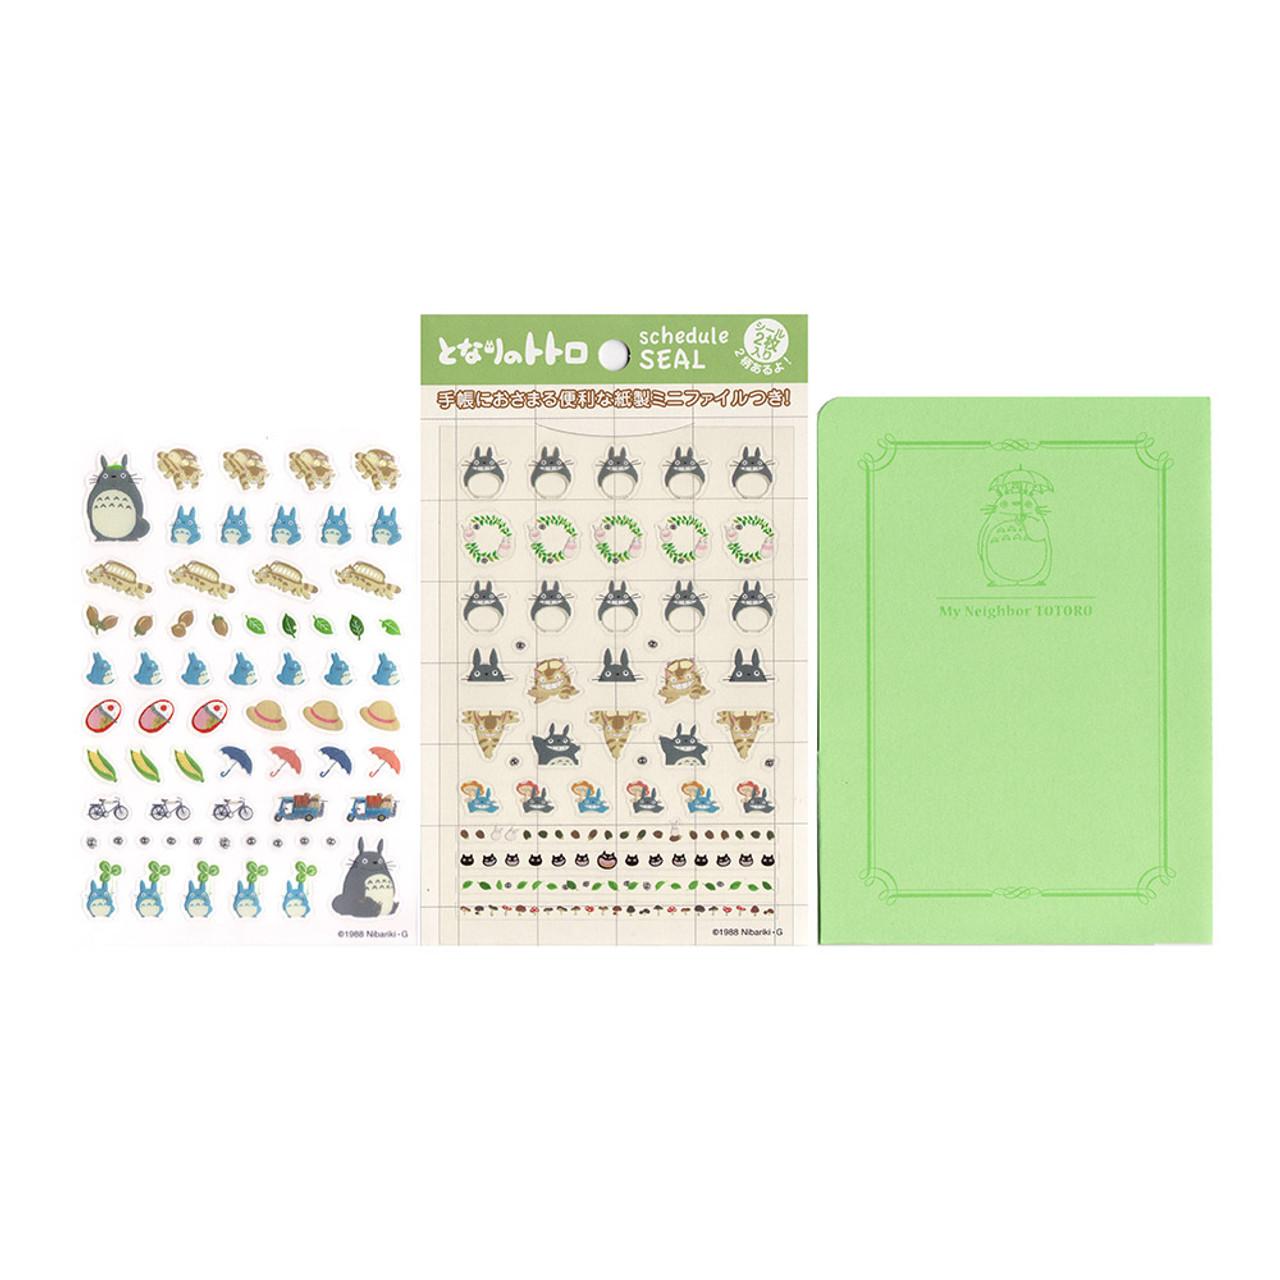 Totoro Schedule Seal 2 Style Sticker Sheet ( Full Set )